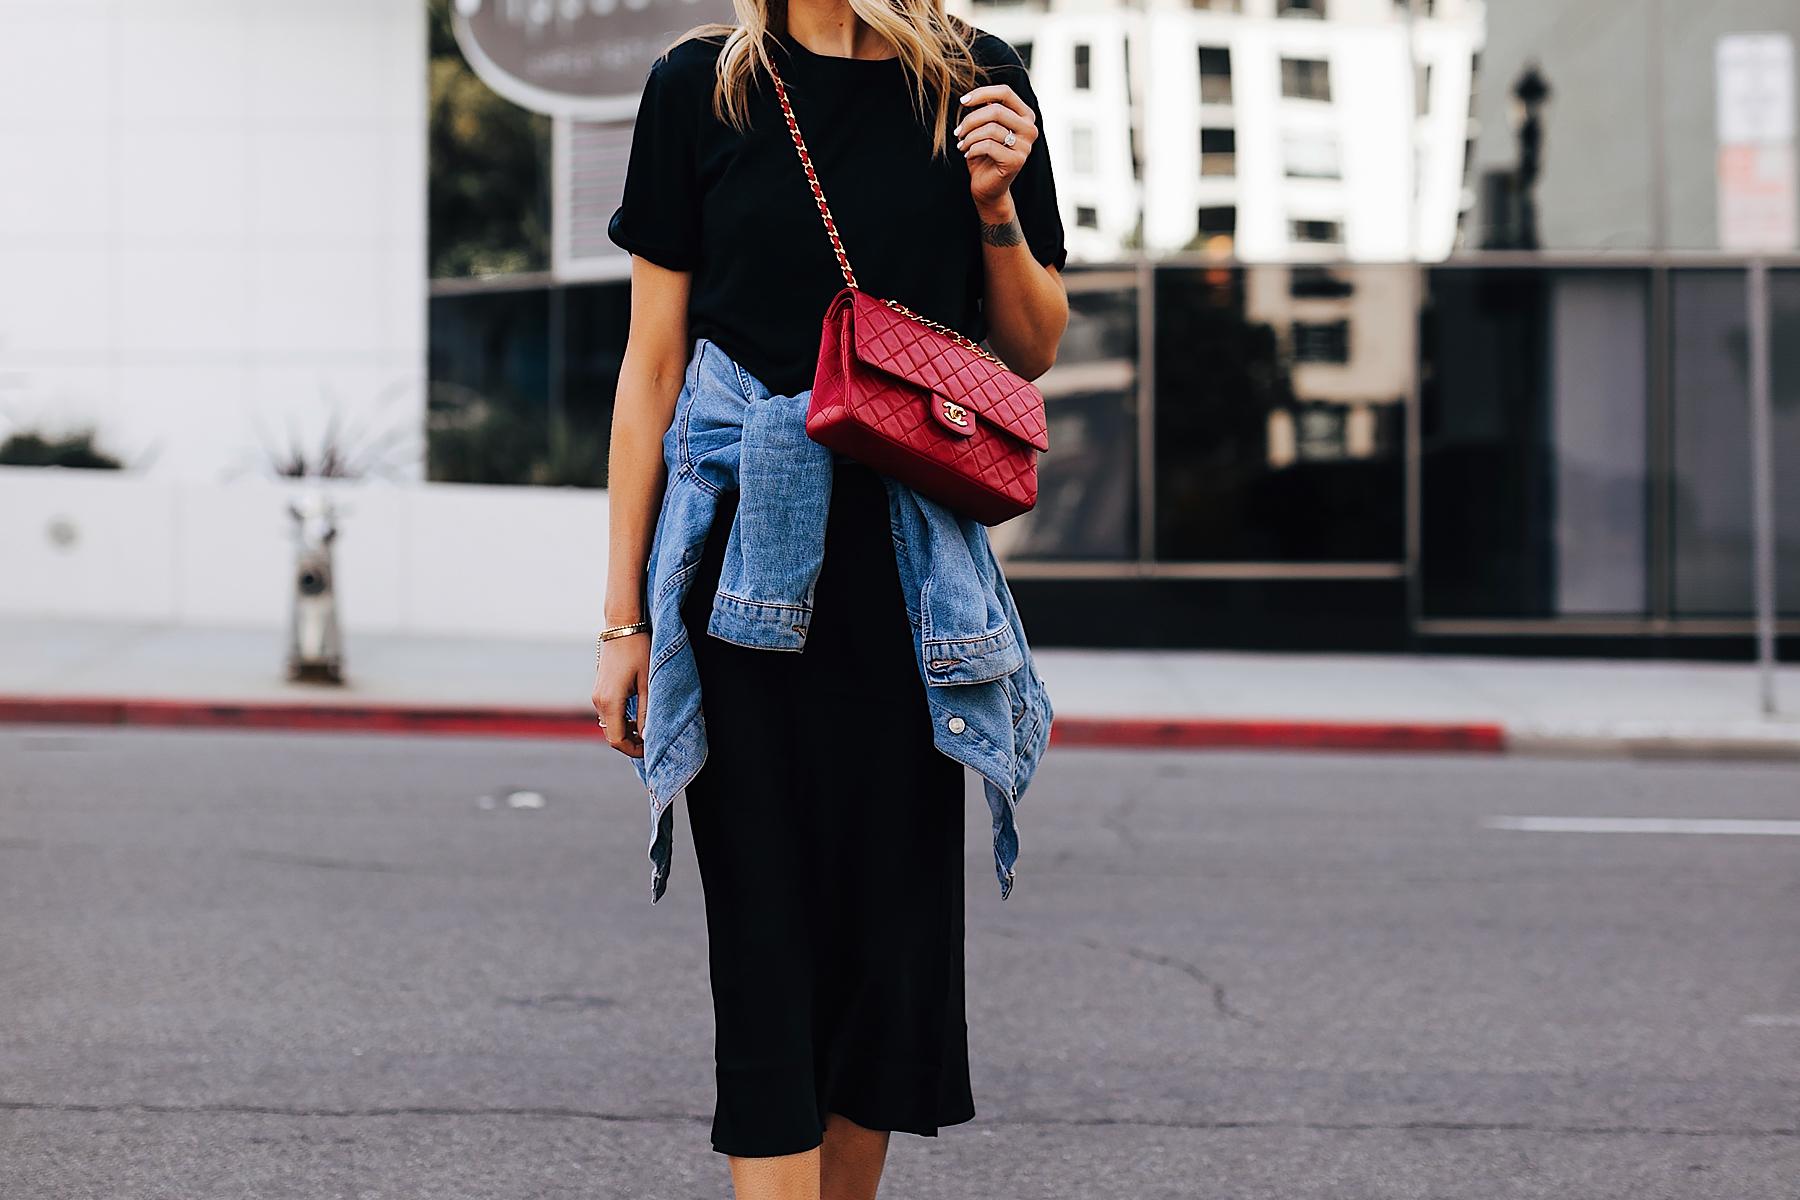 Fashion Jackson Wearing Black Tshirt Black Silk Skirt Denim Jacket Outfit Red Chanel Quilted Handbag